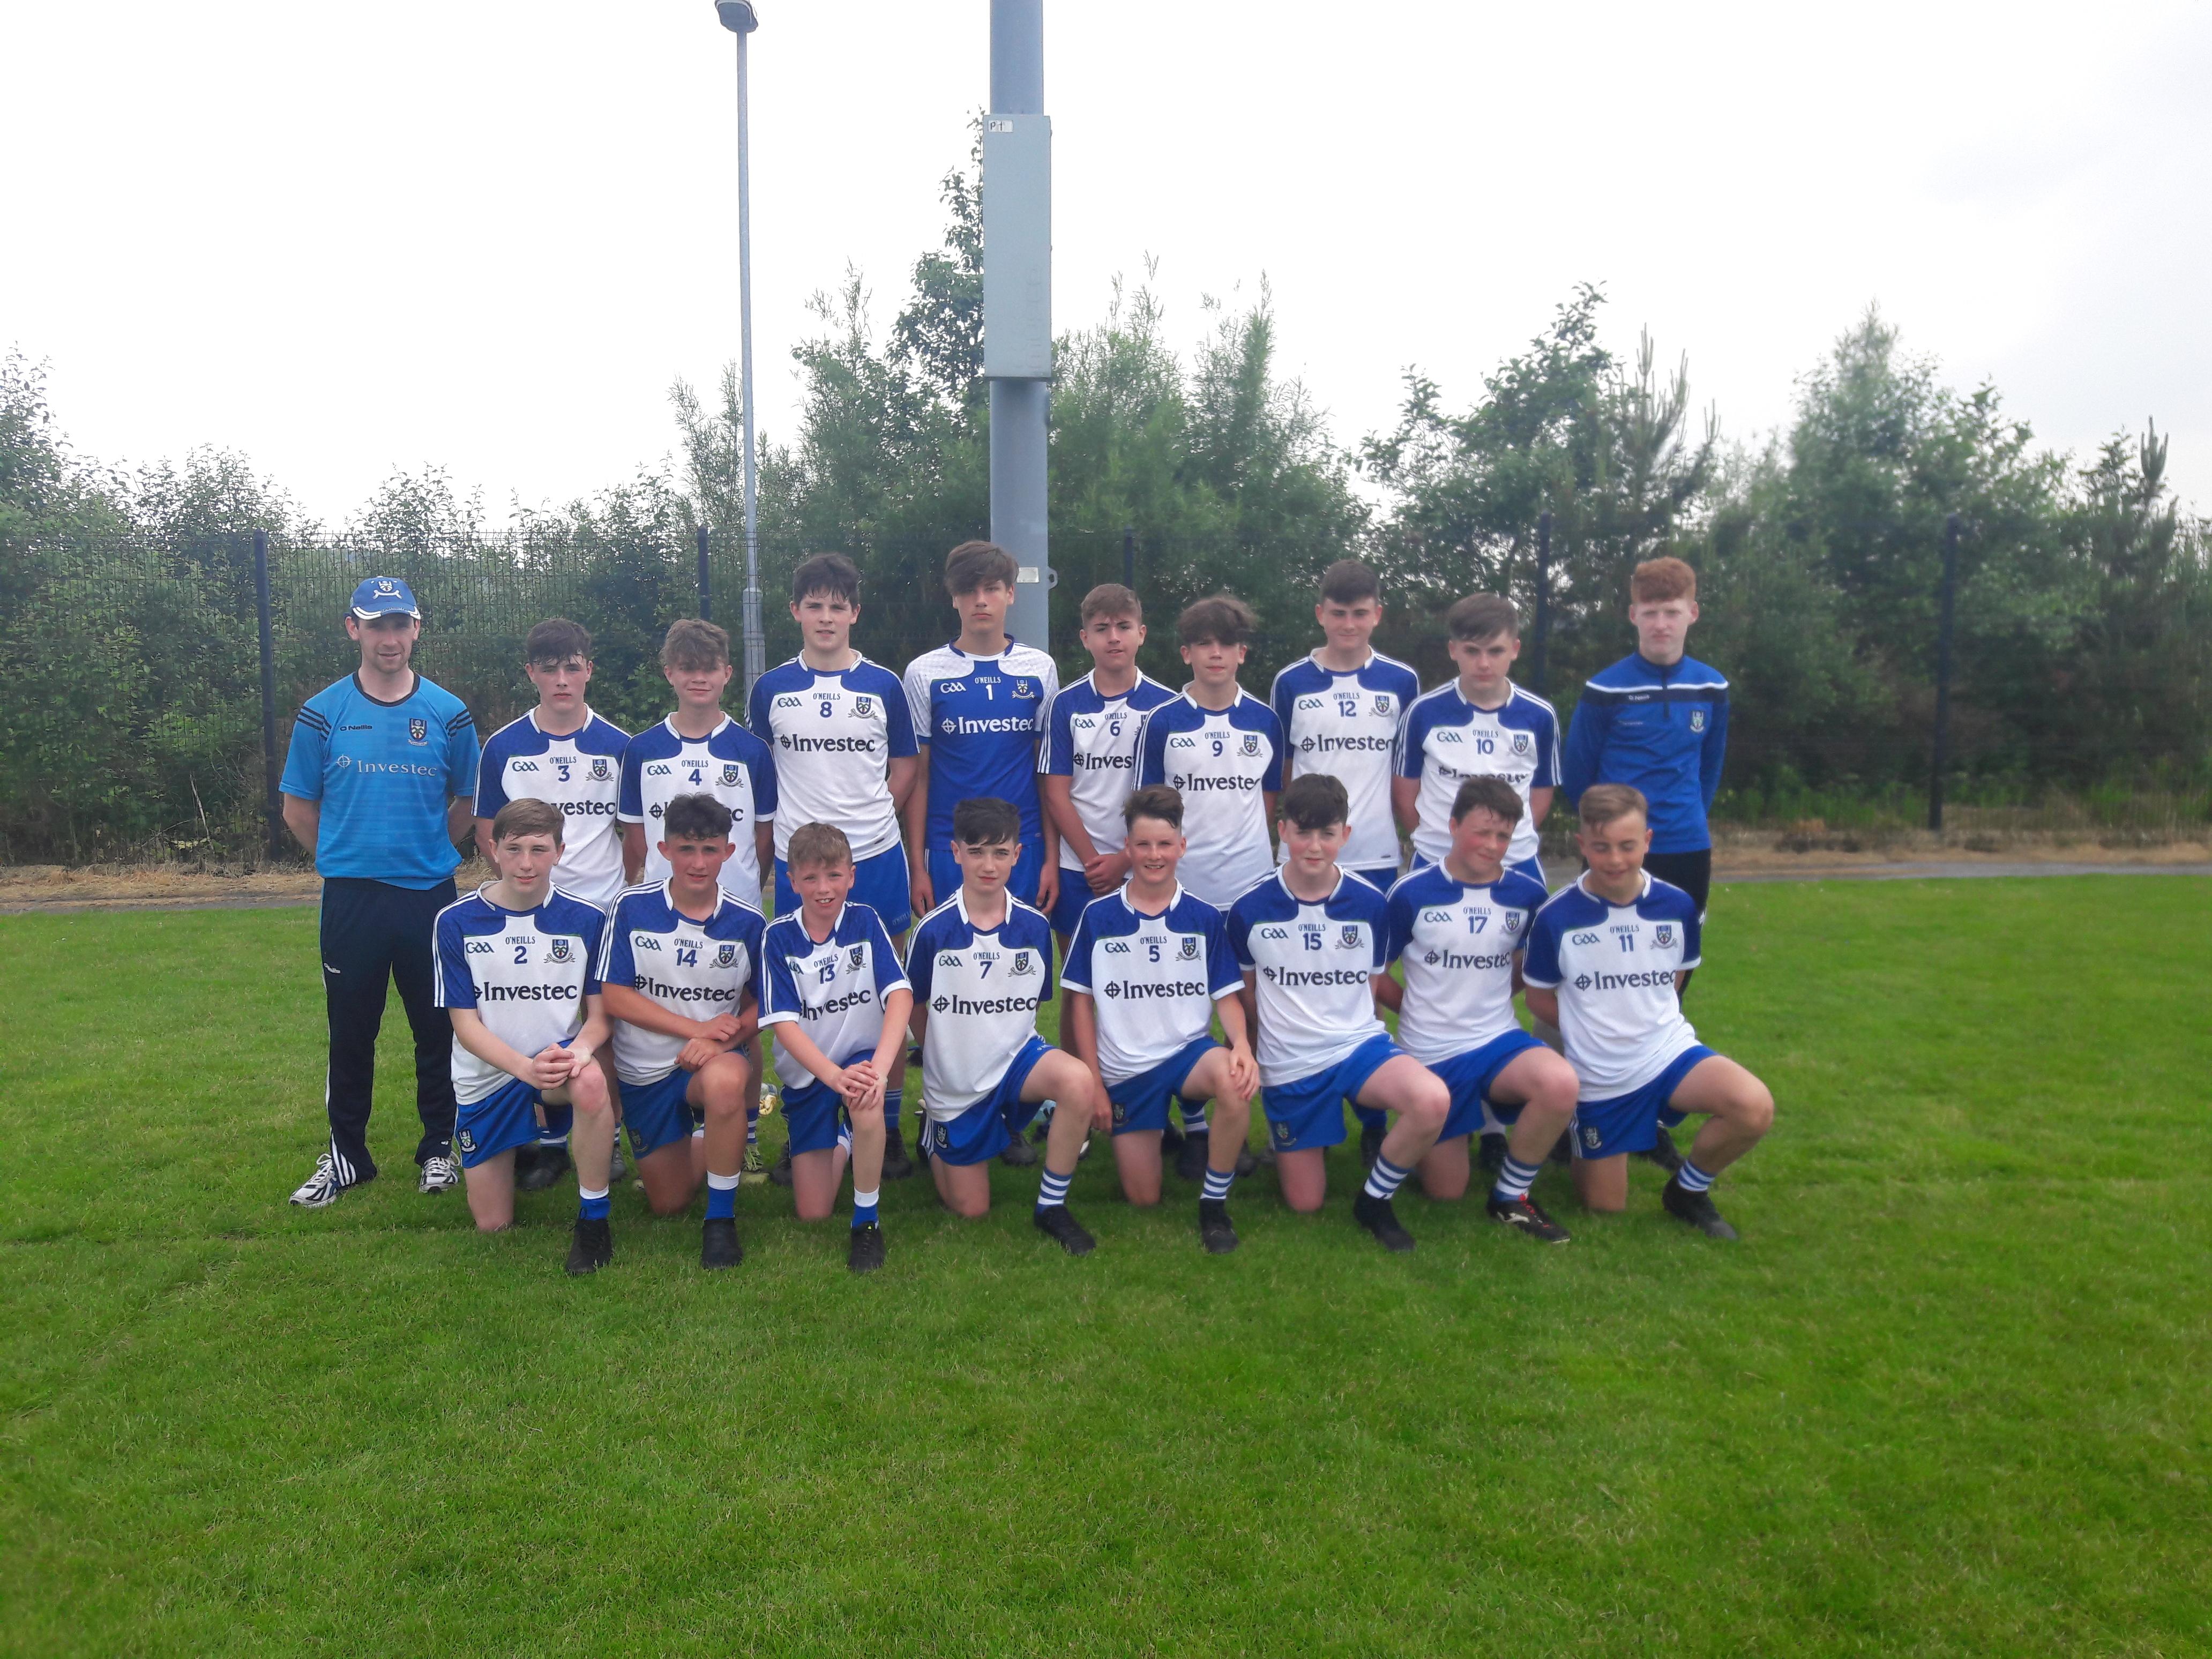 Monaghan U14 Development Squad participate in Ulster Blitz in Garvaghey